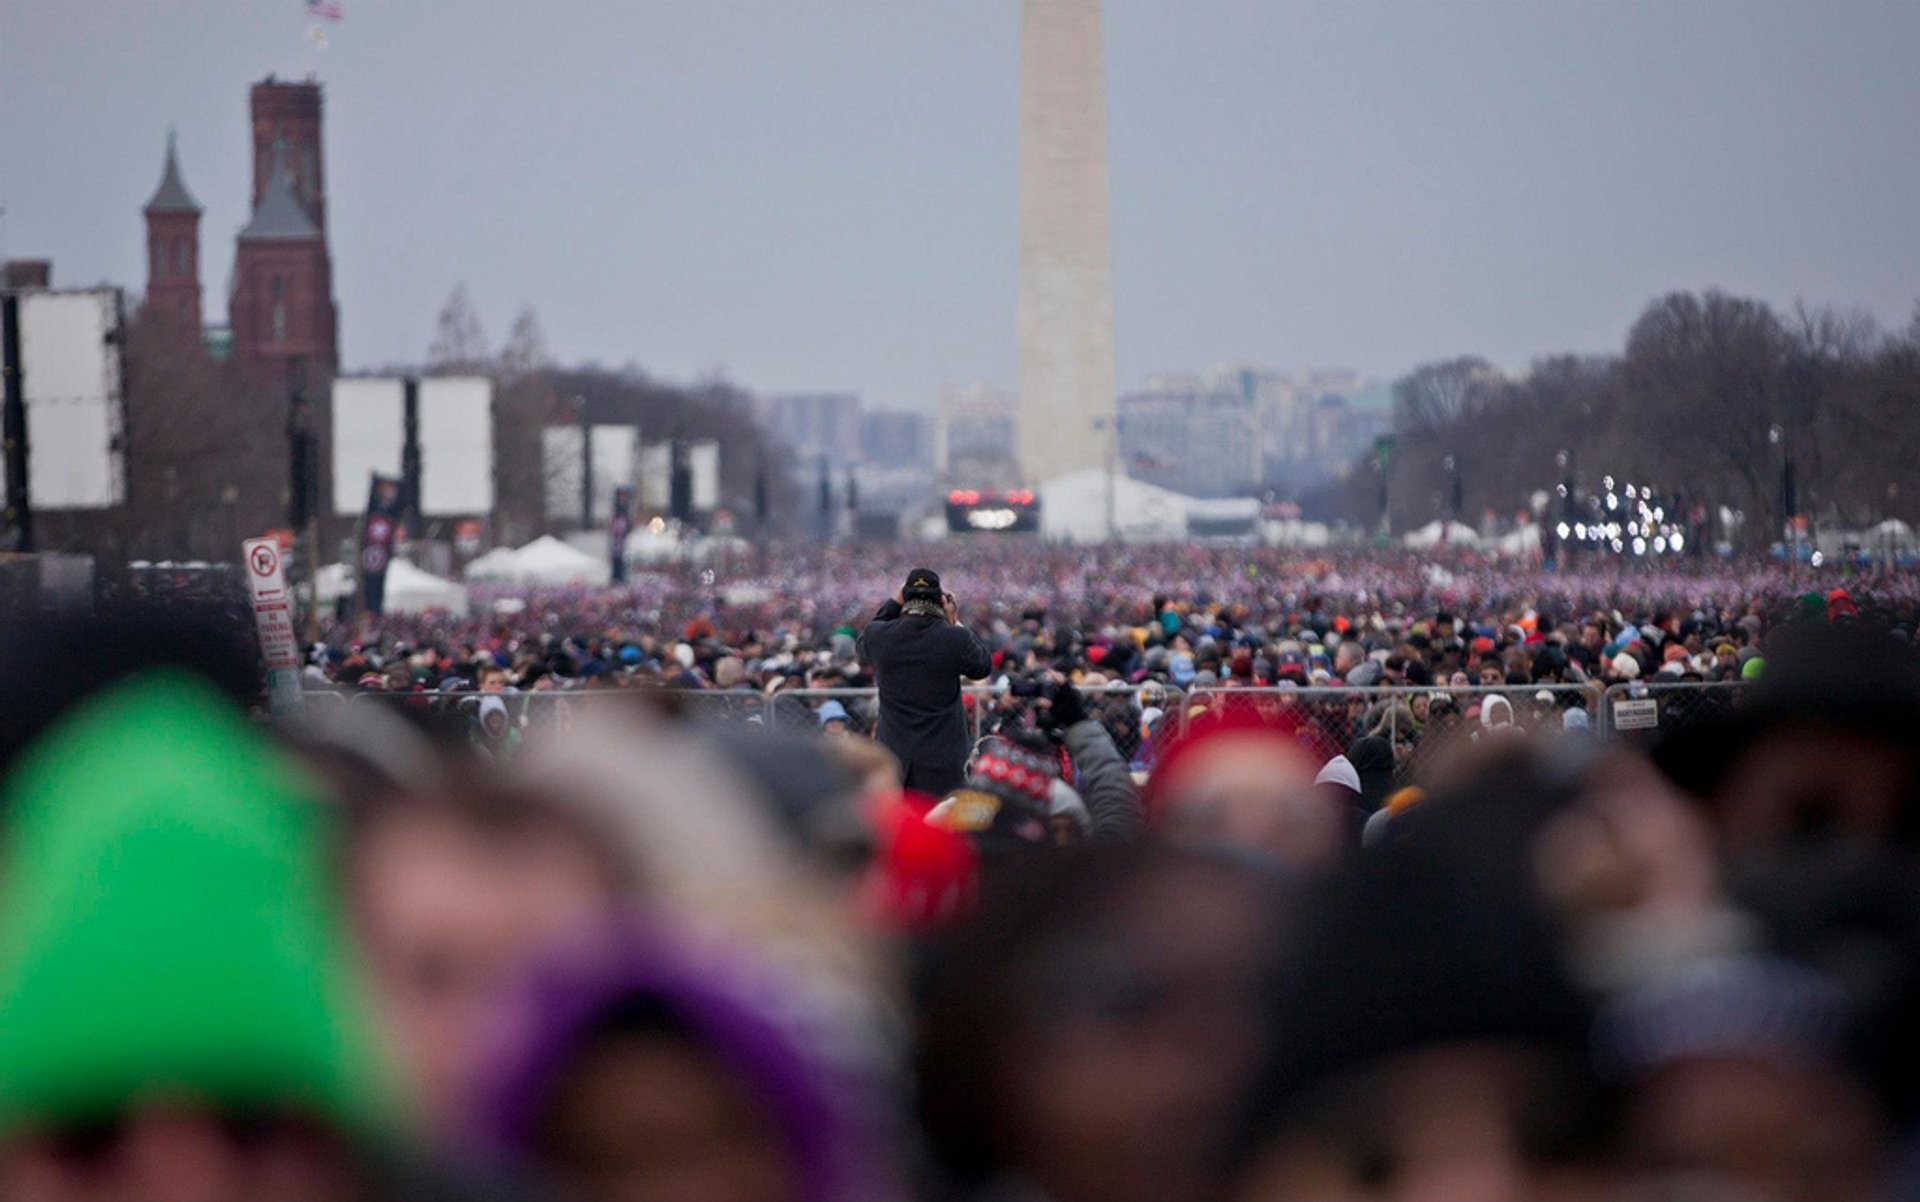 Presidential Inauguration in Washington, D.C. - Best Season 2020